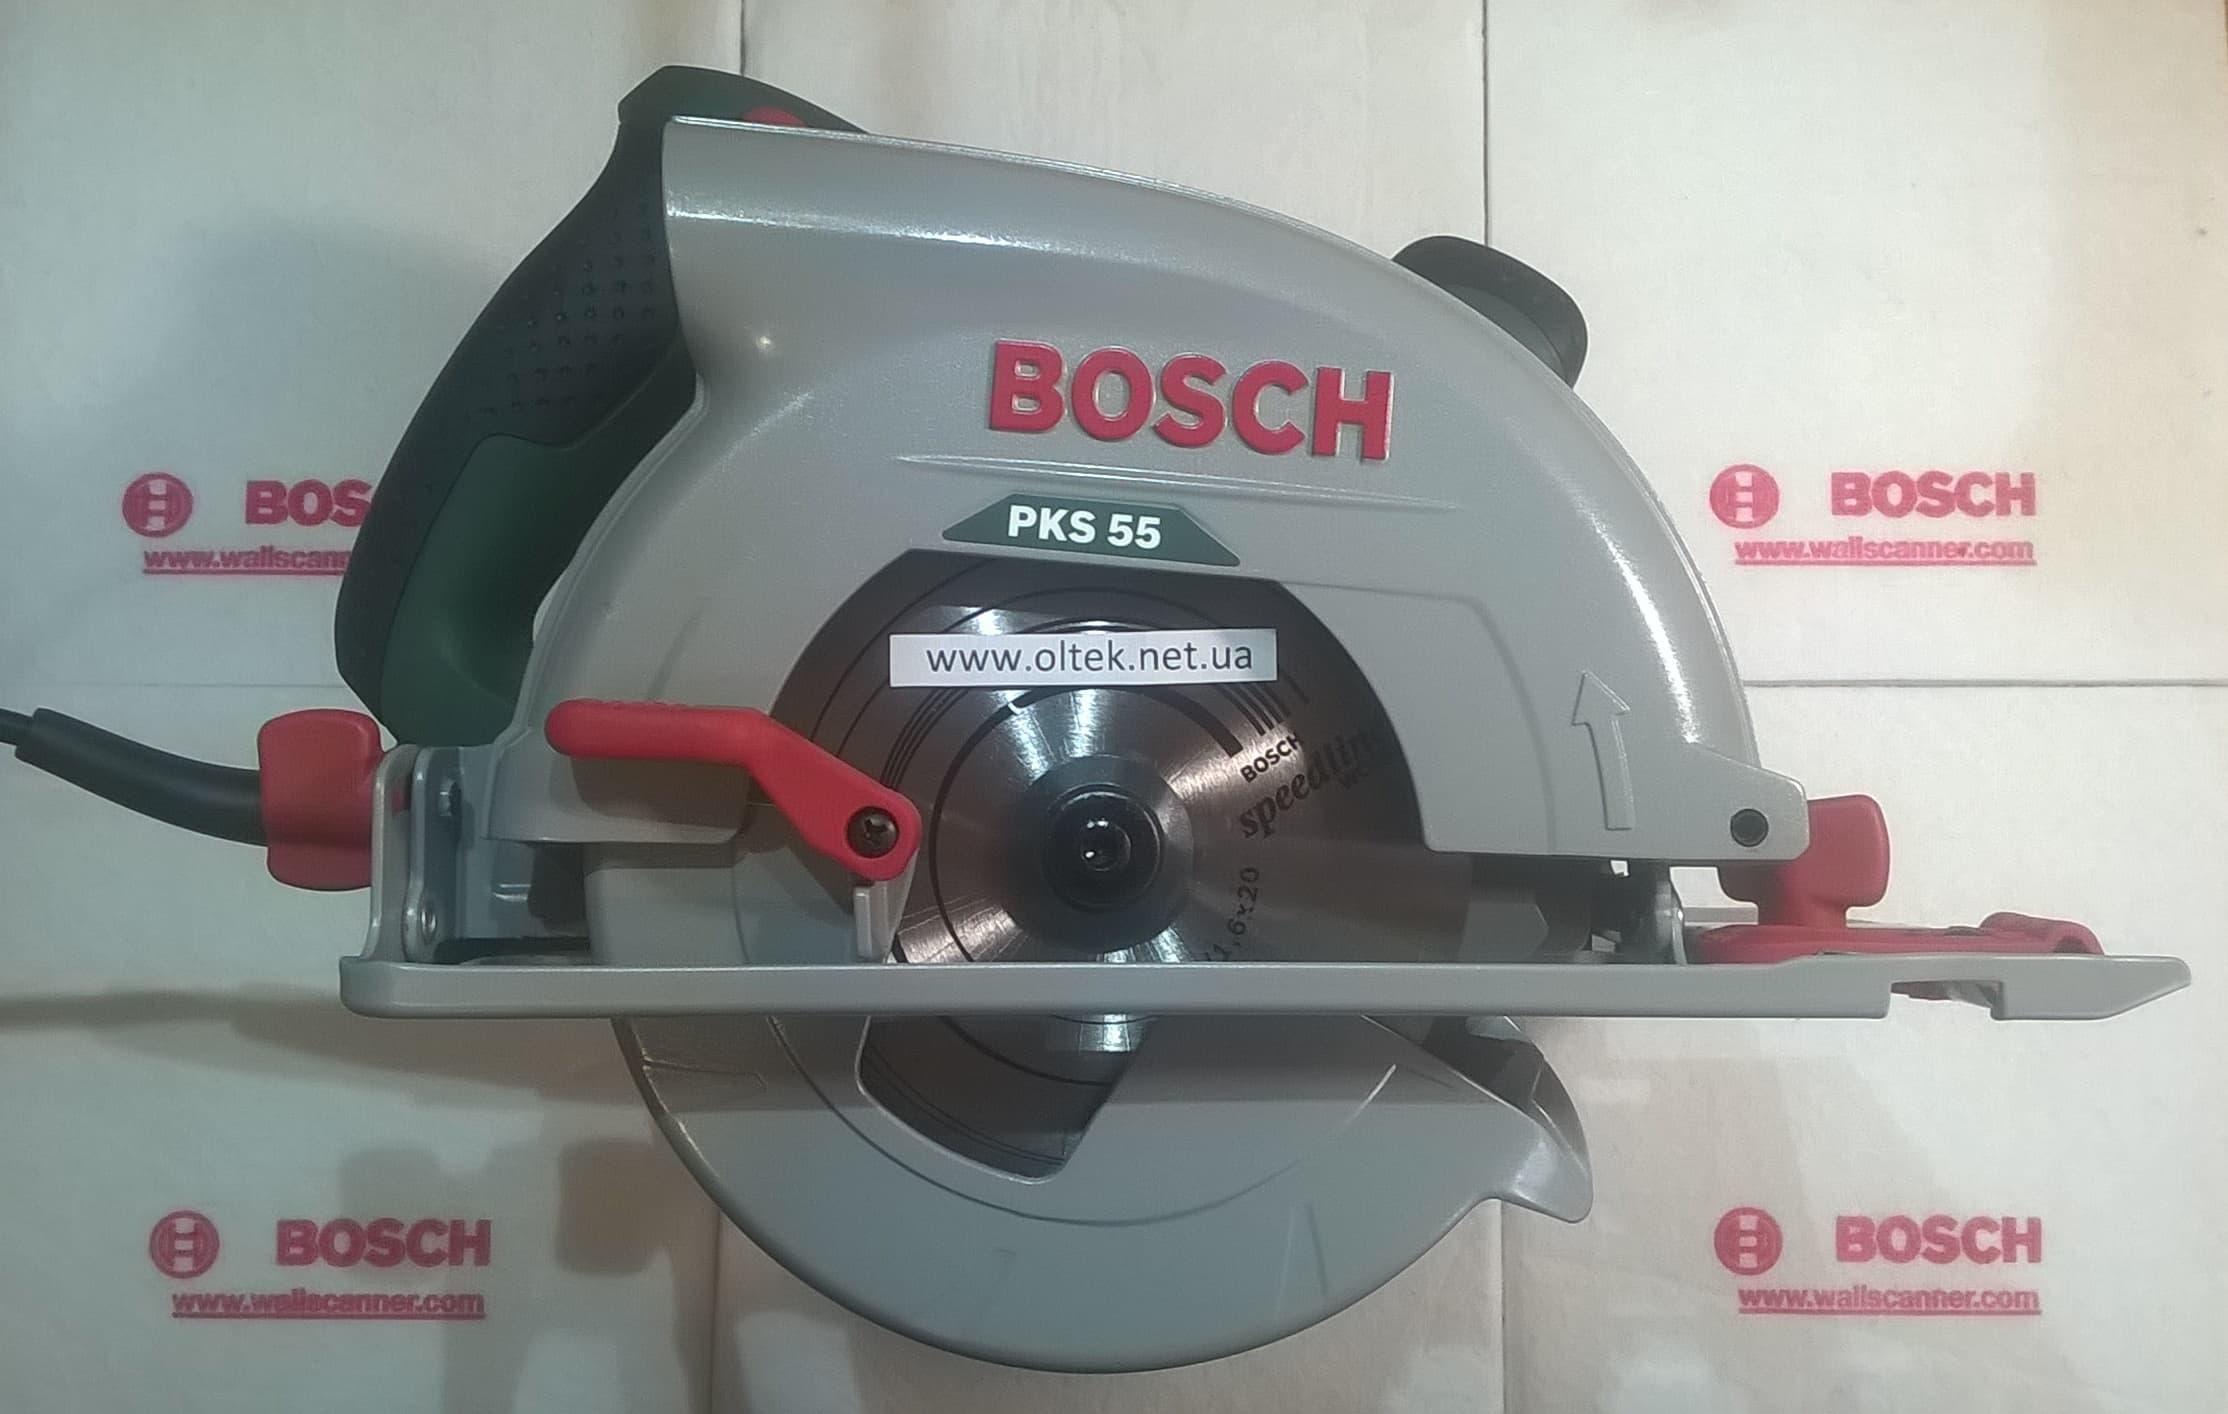 Bosch-PKS-55